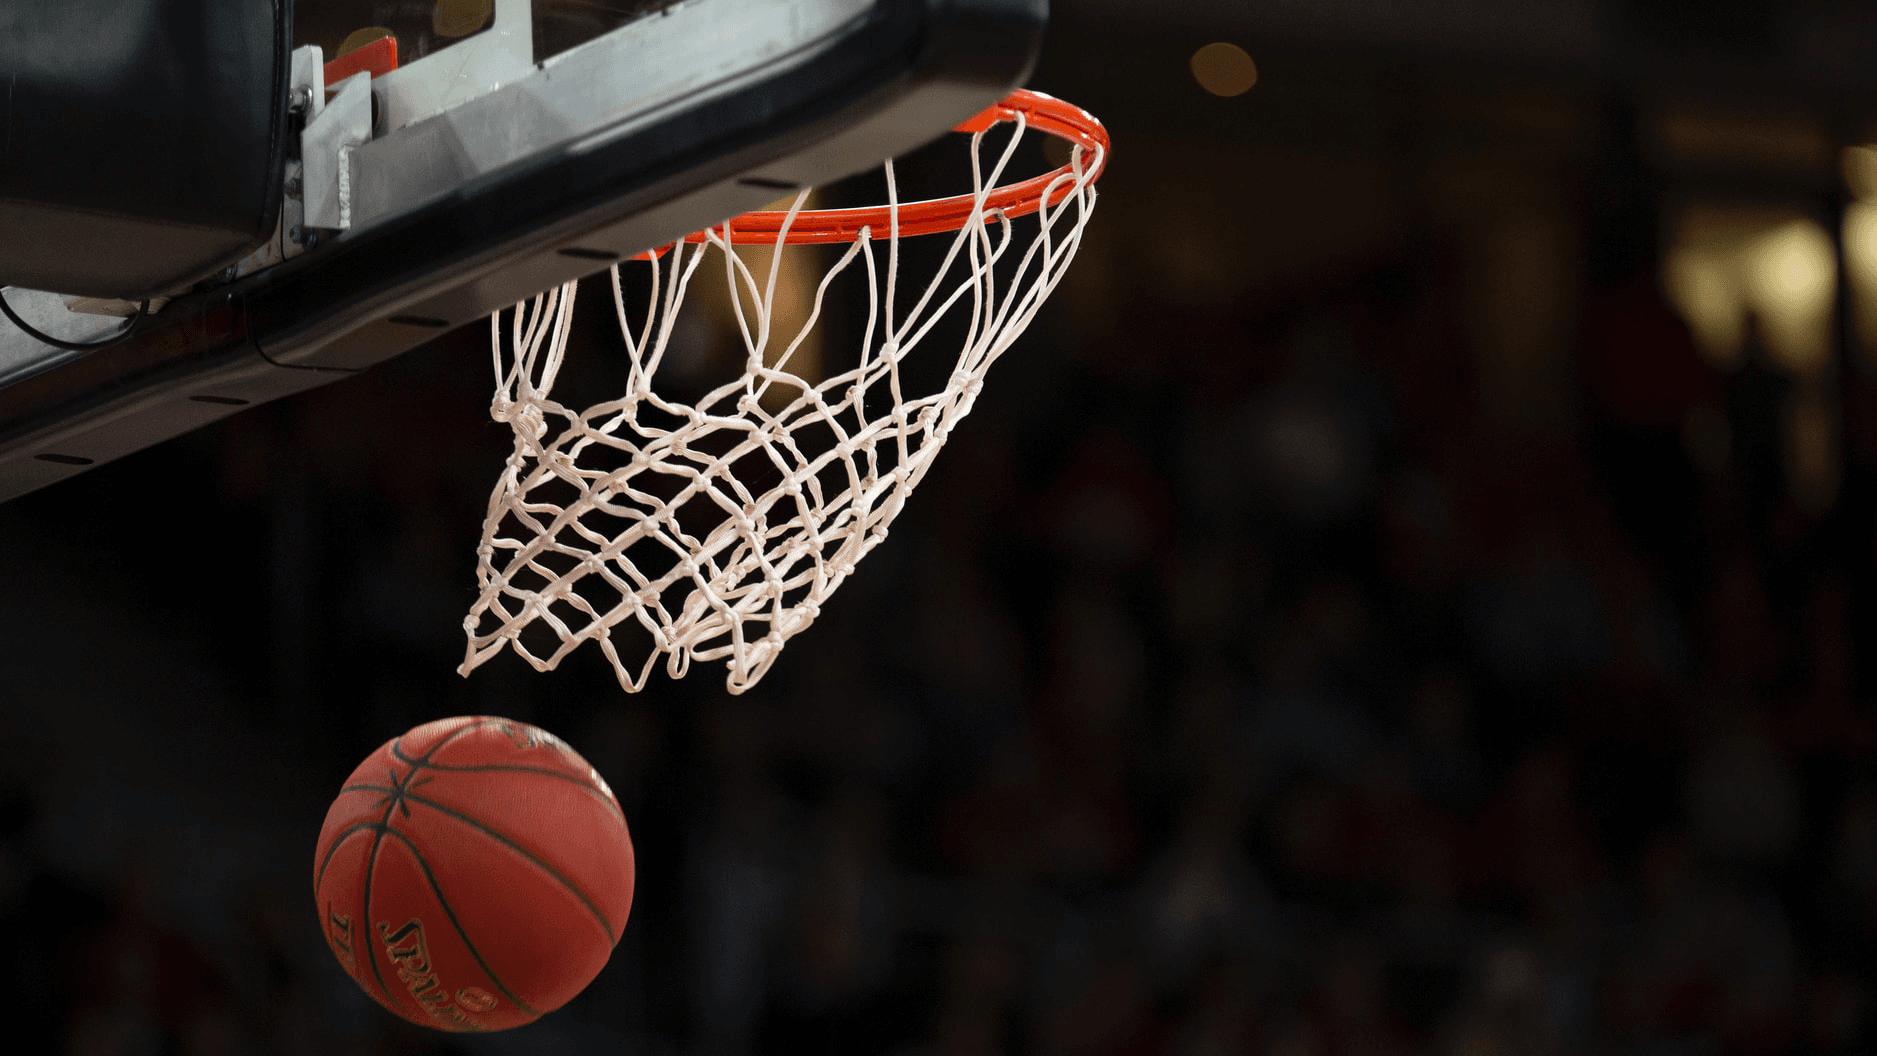 NBA Championship Odds: Bucks New Favorites to Win Championship